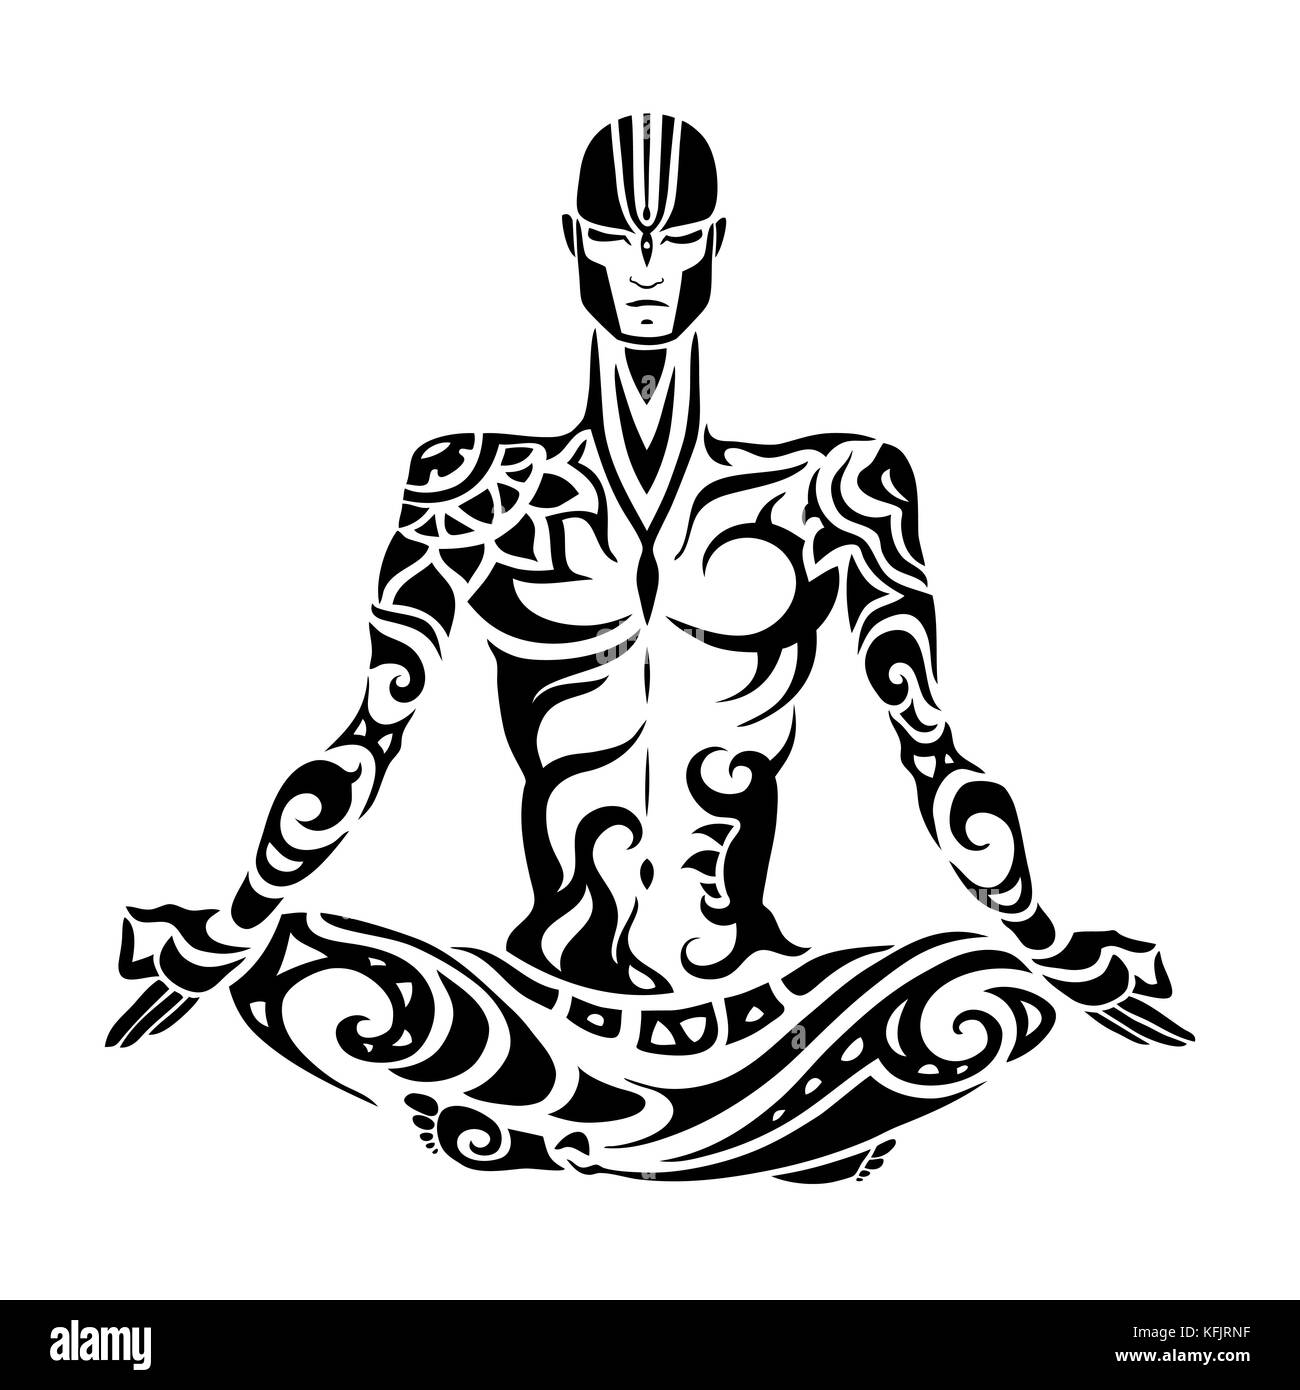 Yoga Man Silhouette Hand Drawn Vector Illustration Meditation In Lotus Pose Padmasana